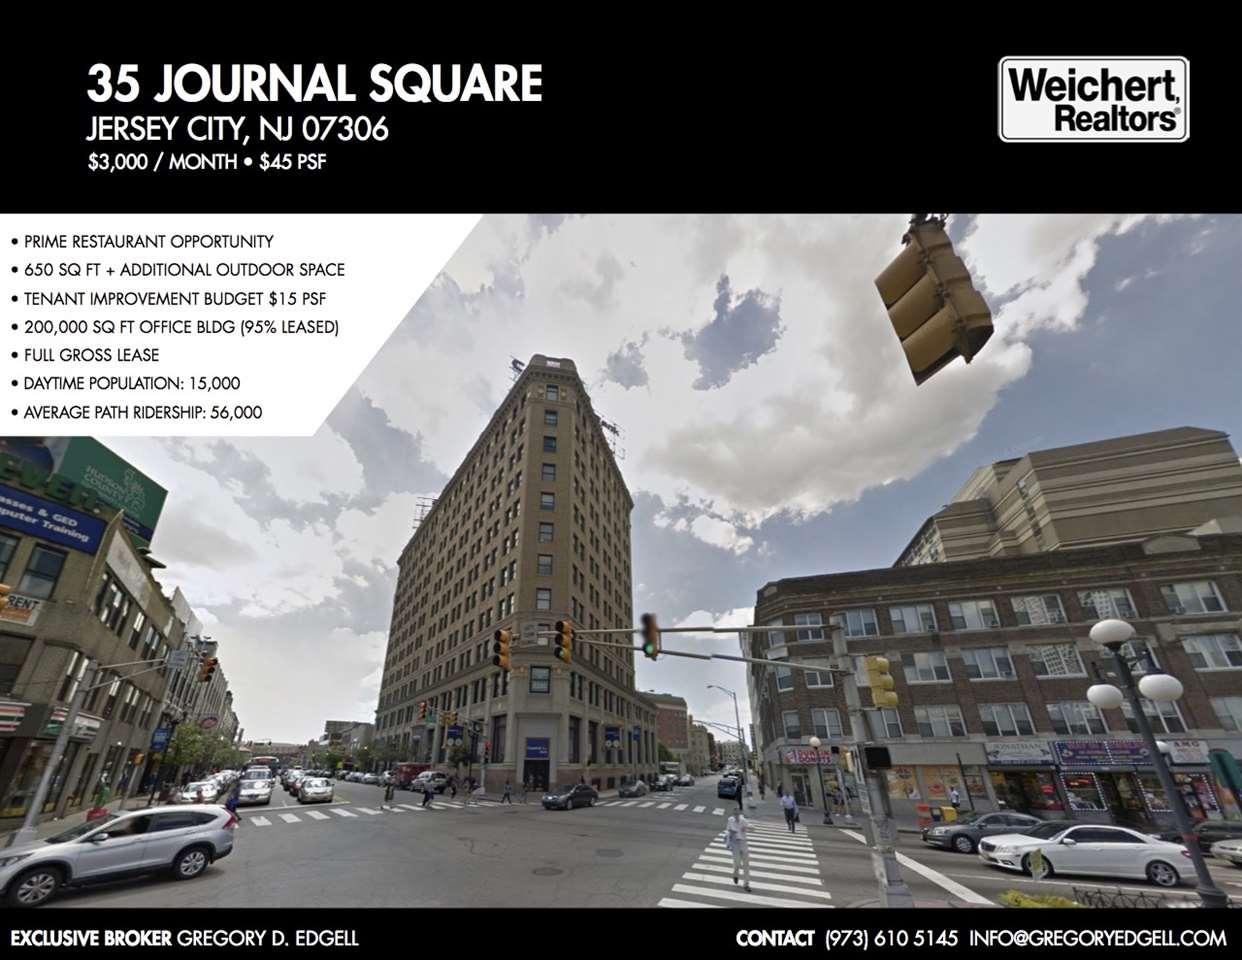 35 JOURNAL SQUARE PLAZA, JC, Journal Square, NJ 07306